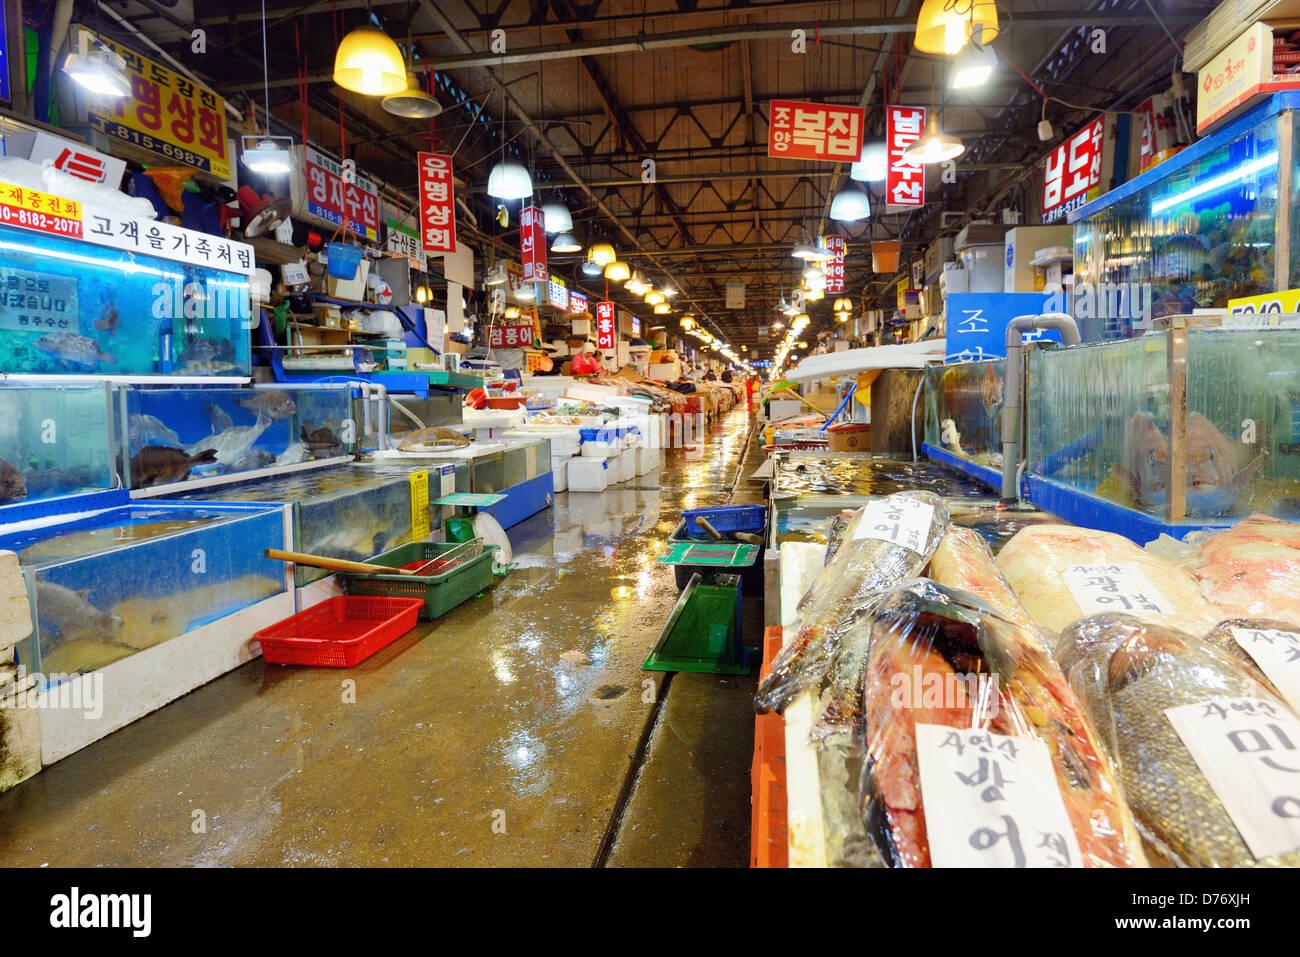 Noryangjin Fisheries Wholesale Market in Seoul, South Korea Stock Photo